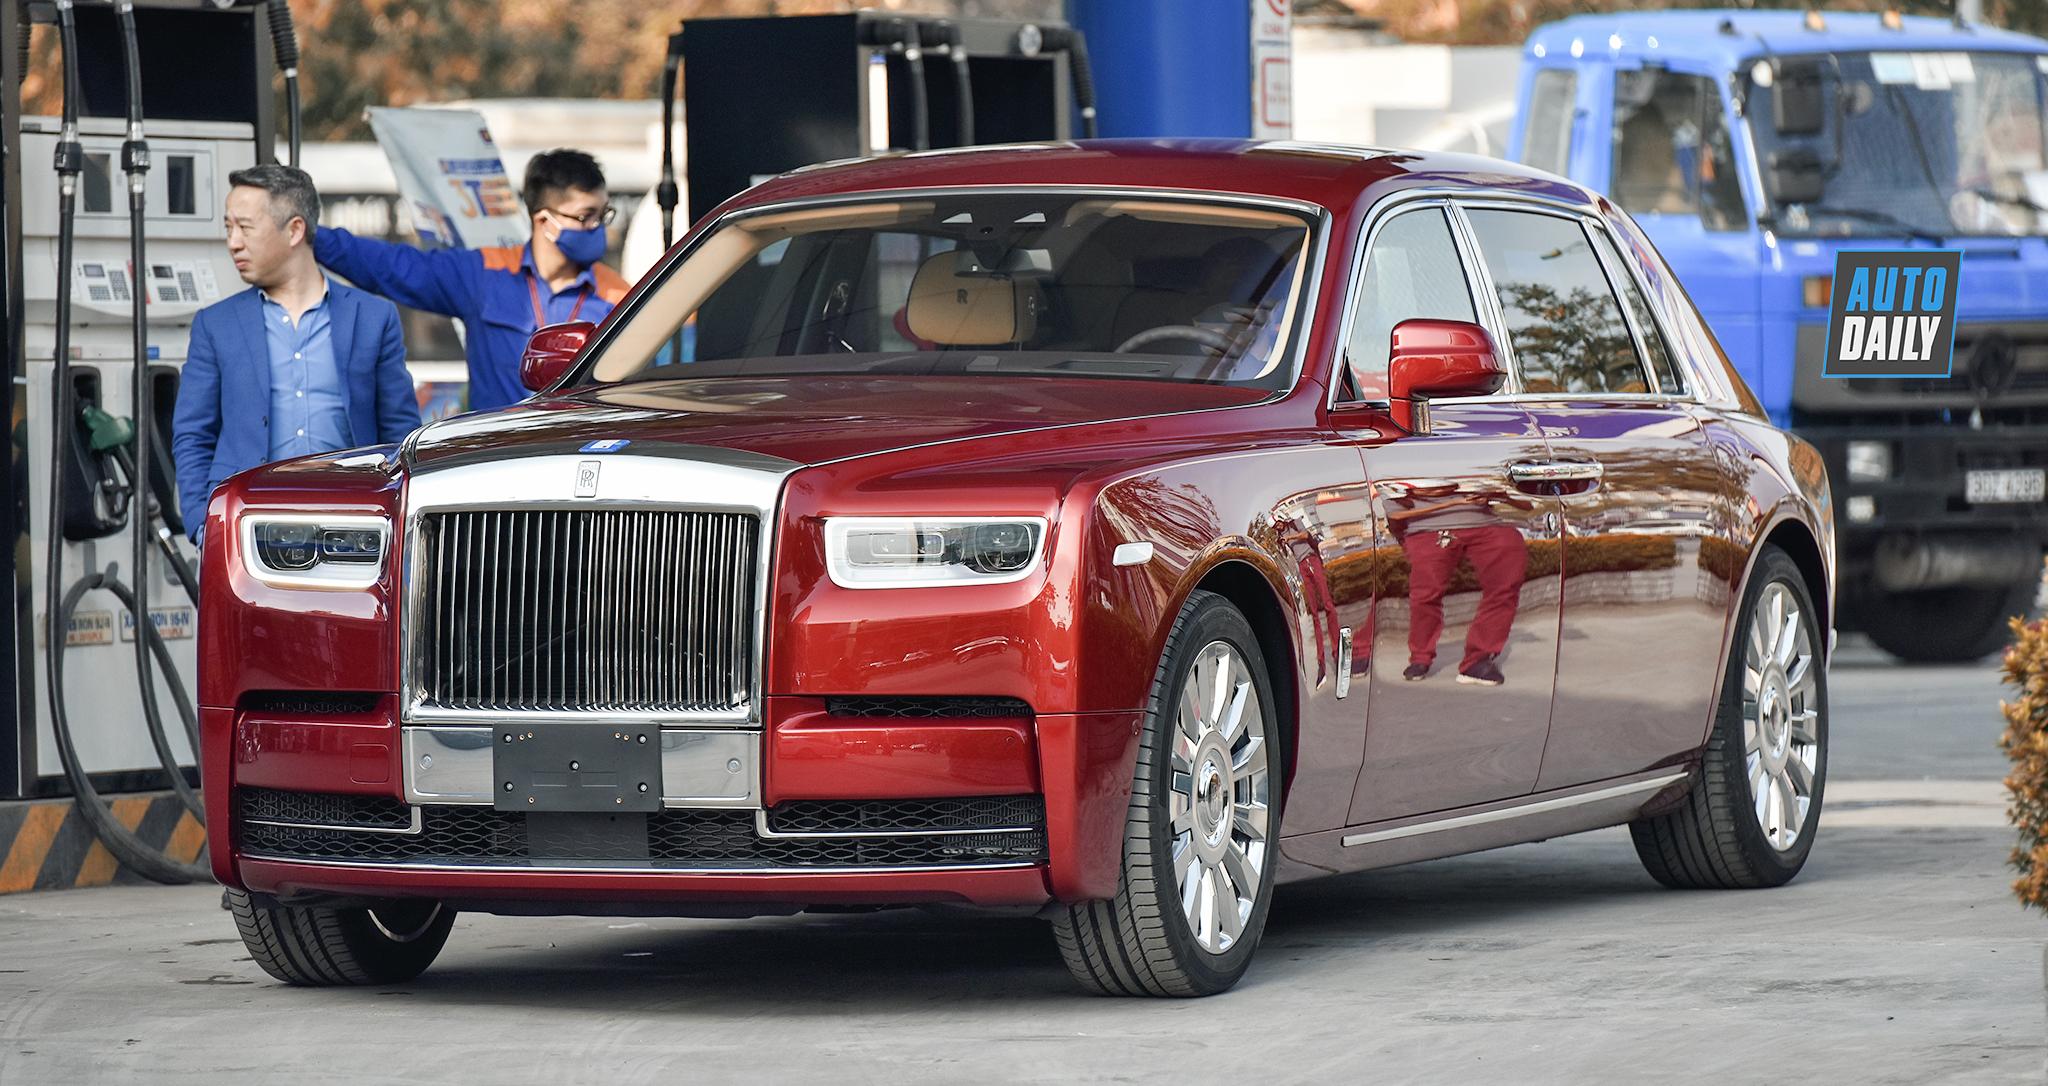 rolls-royce-phantom-2018-autodaily-13.jpg